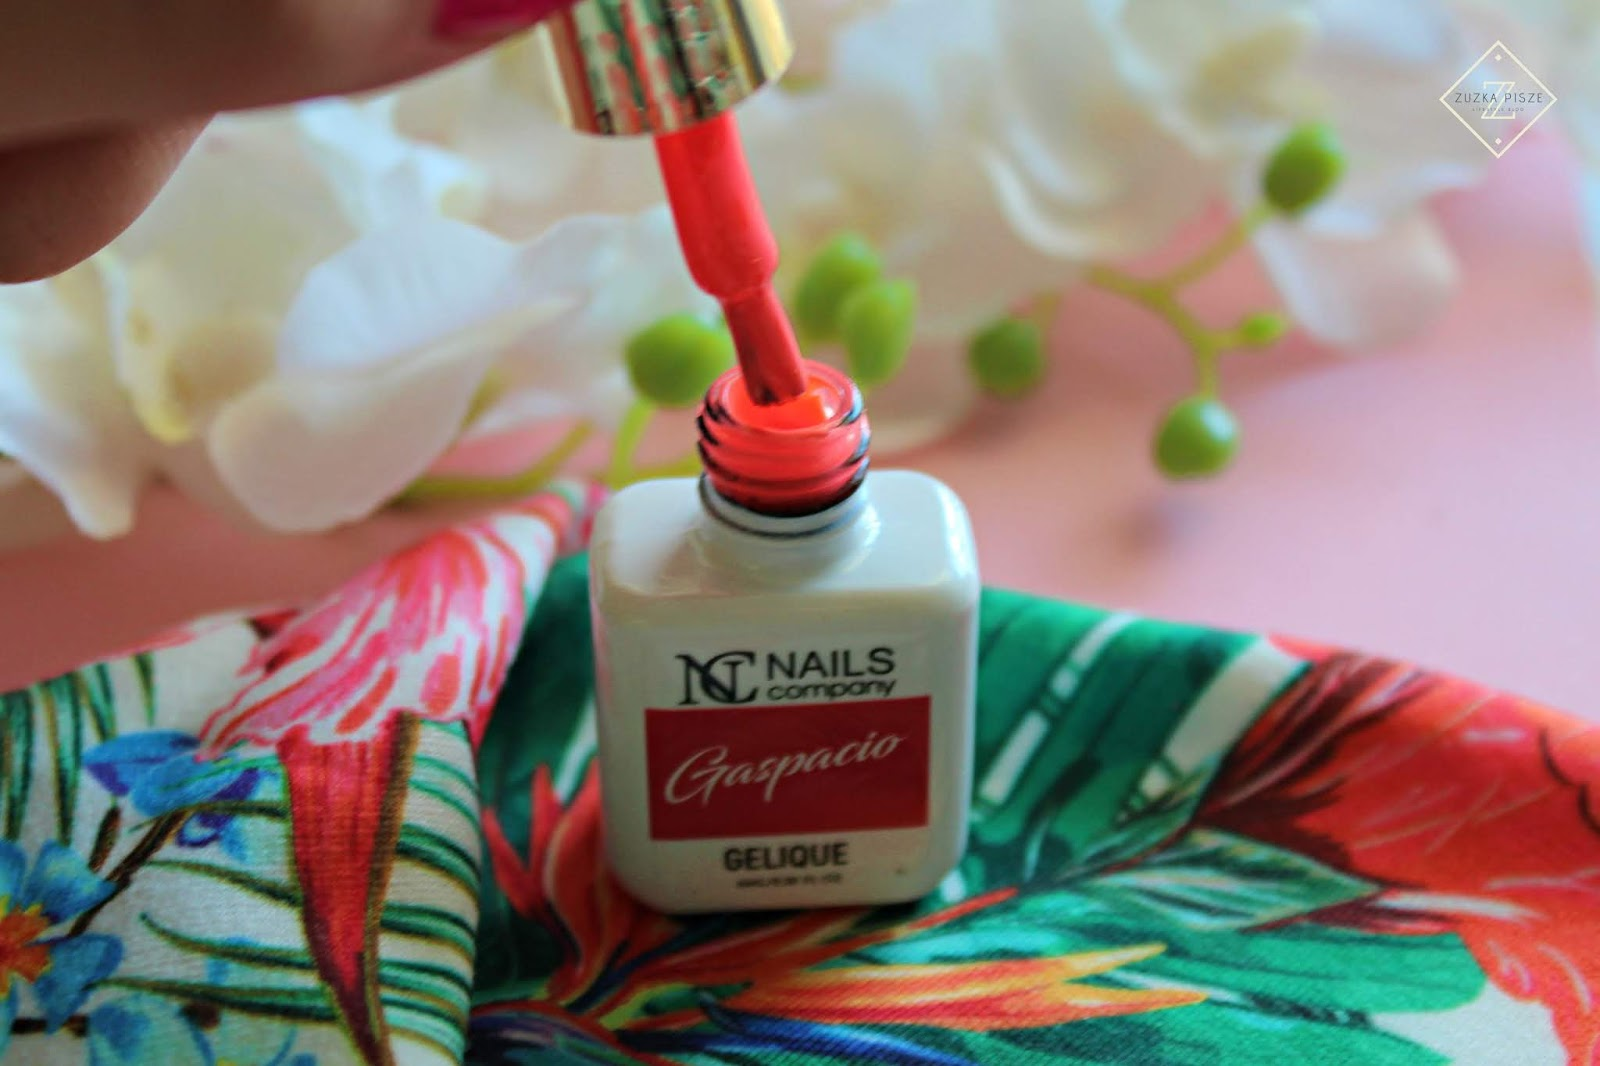 Lakier Hybrydowy Gaspacio NC Nails Company